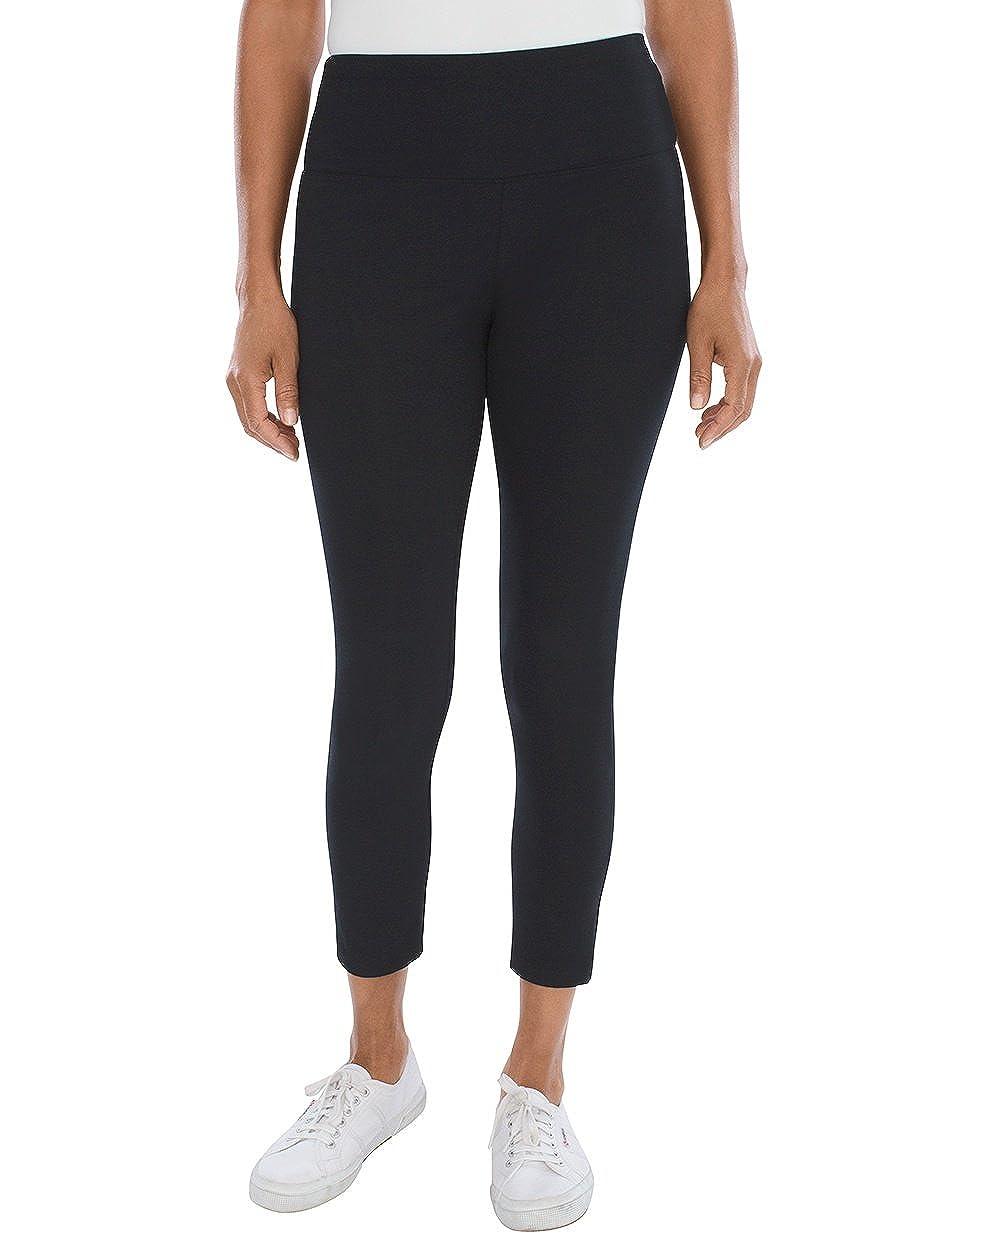 52fdad8056946 Chico's Women's Zenergy So Slimming Crop Leggings Black at Amazon Women's  Clothing store: